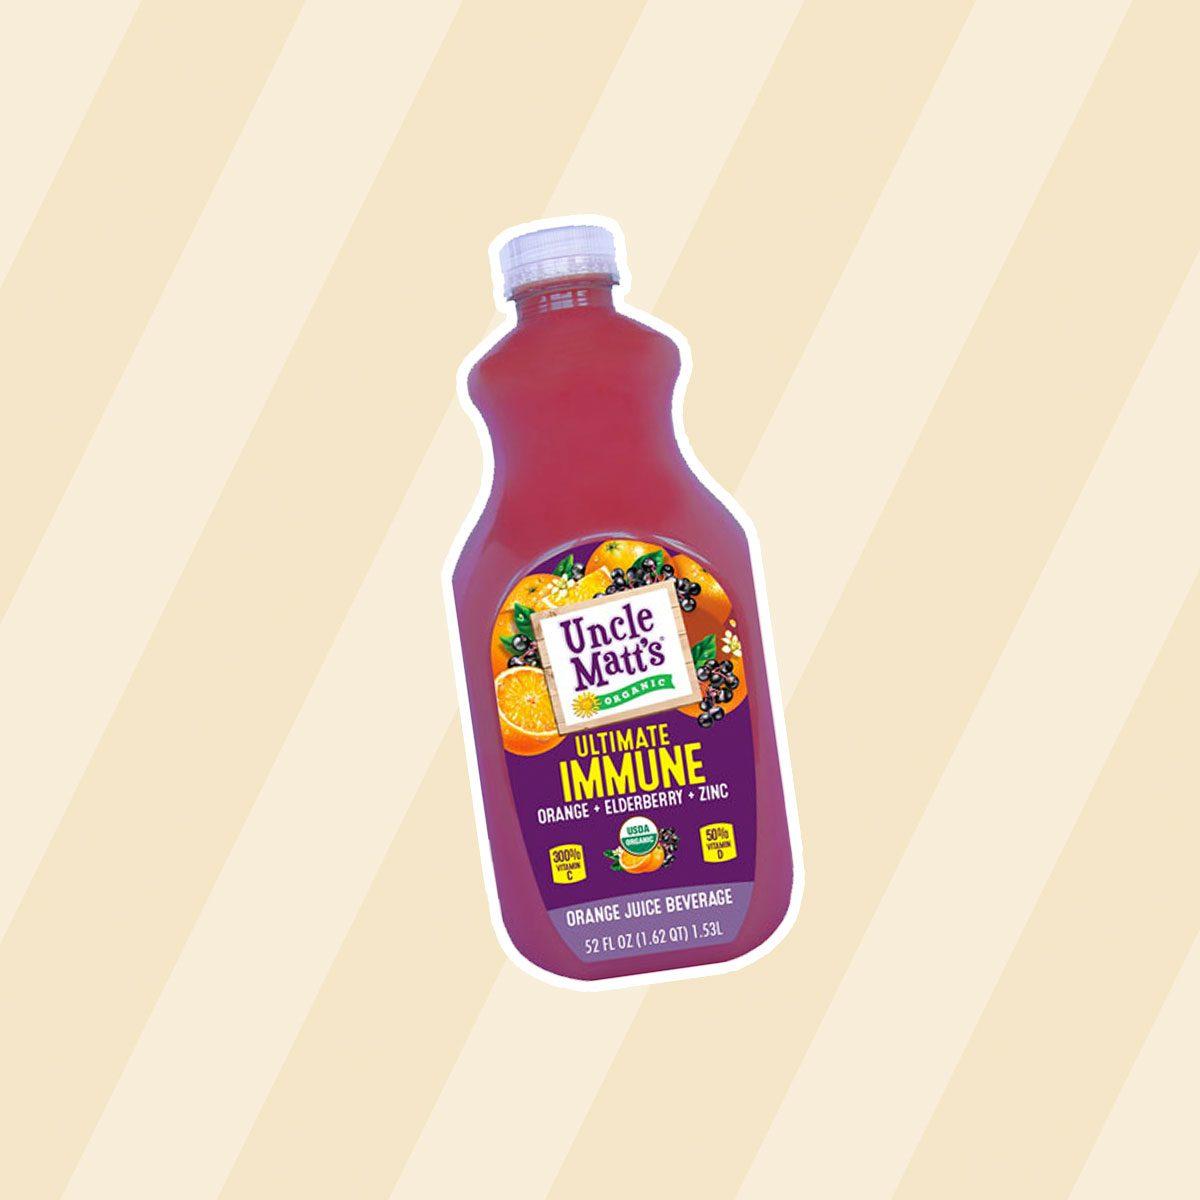 healthy snacks to buy Uncle Matt's Organic Ultimate Immune Juice